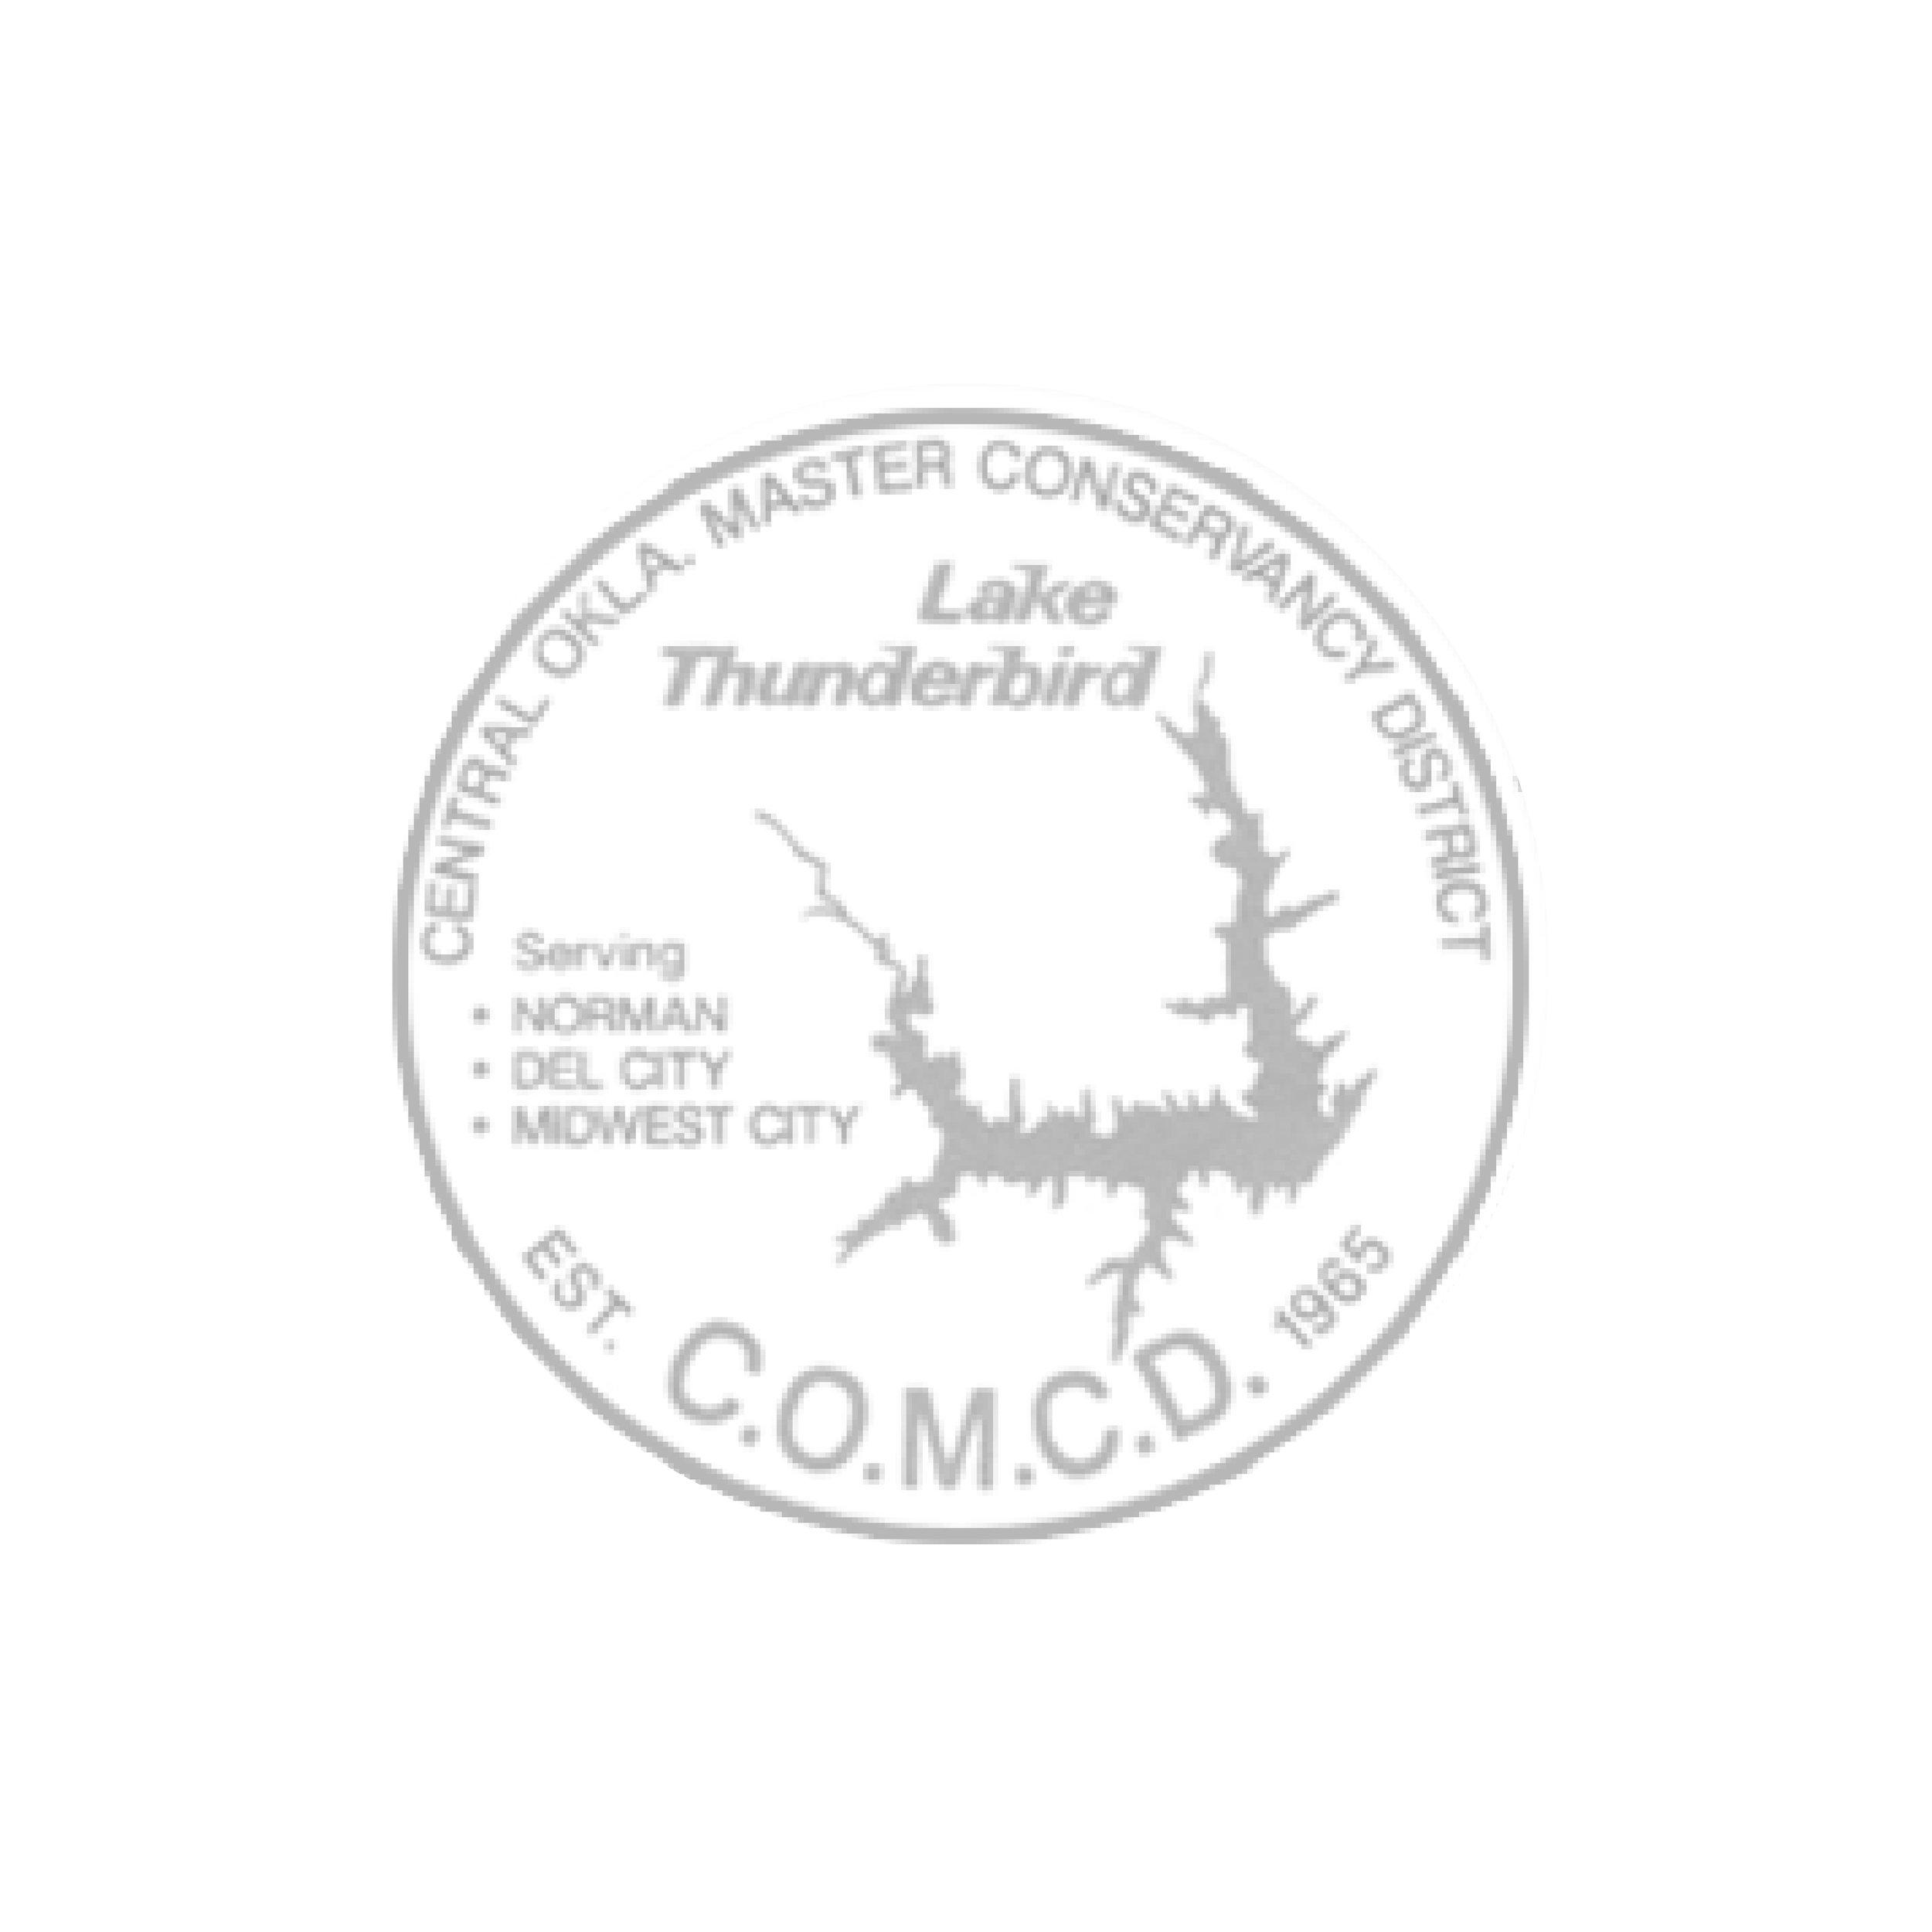 COMCD-01.jpg